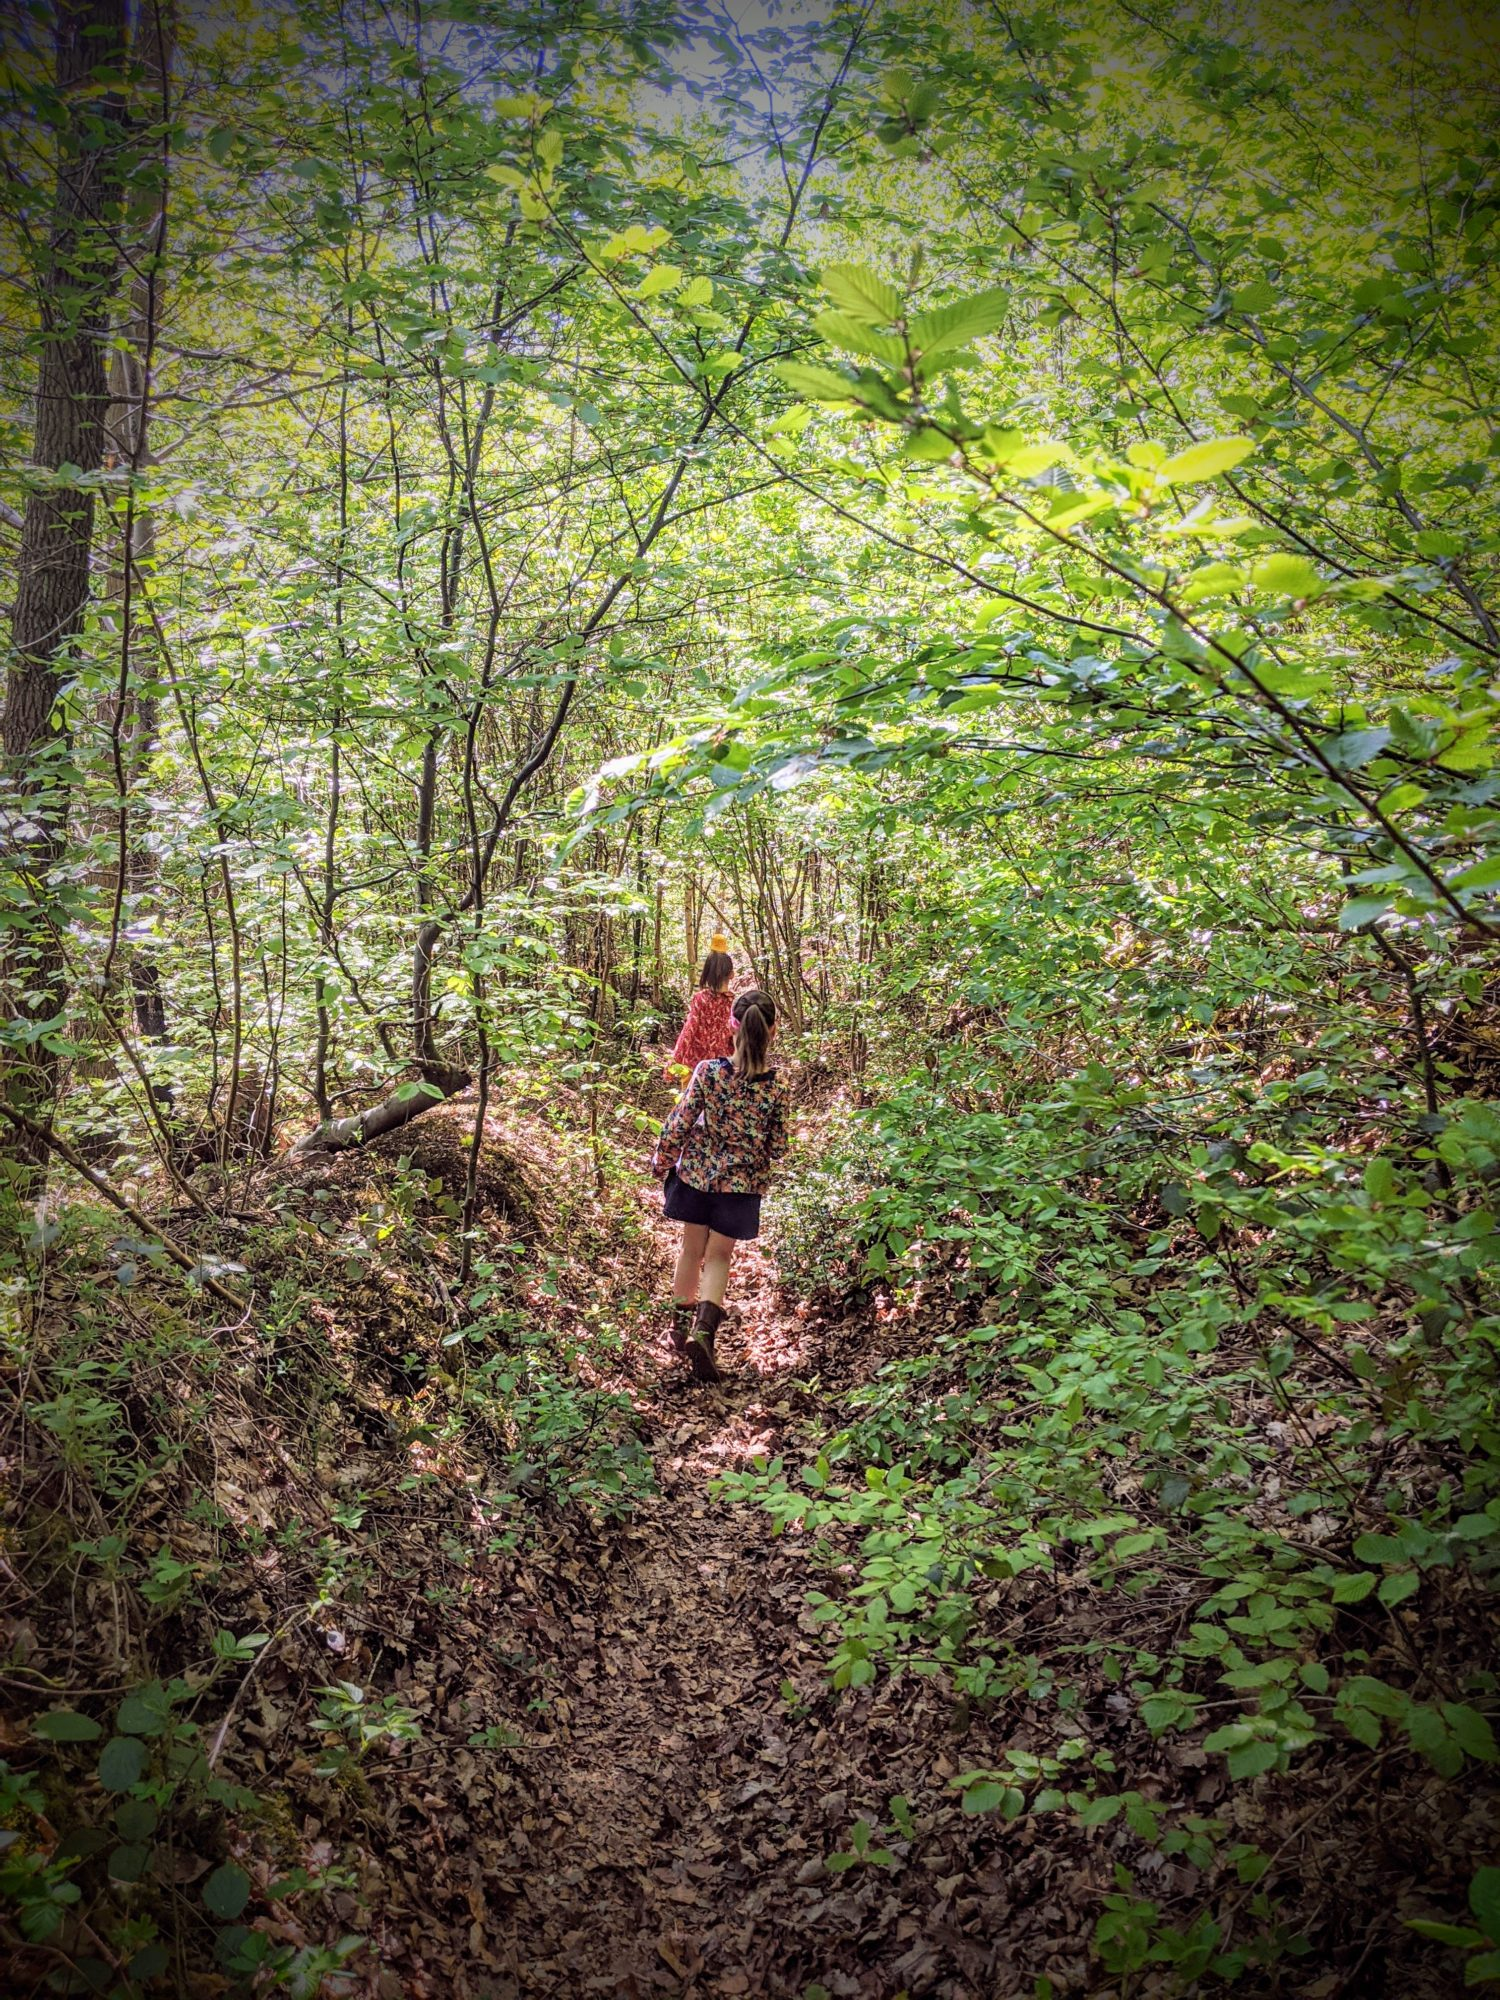 En balade dans la forêt